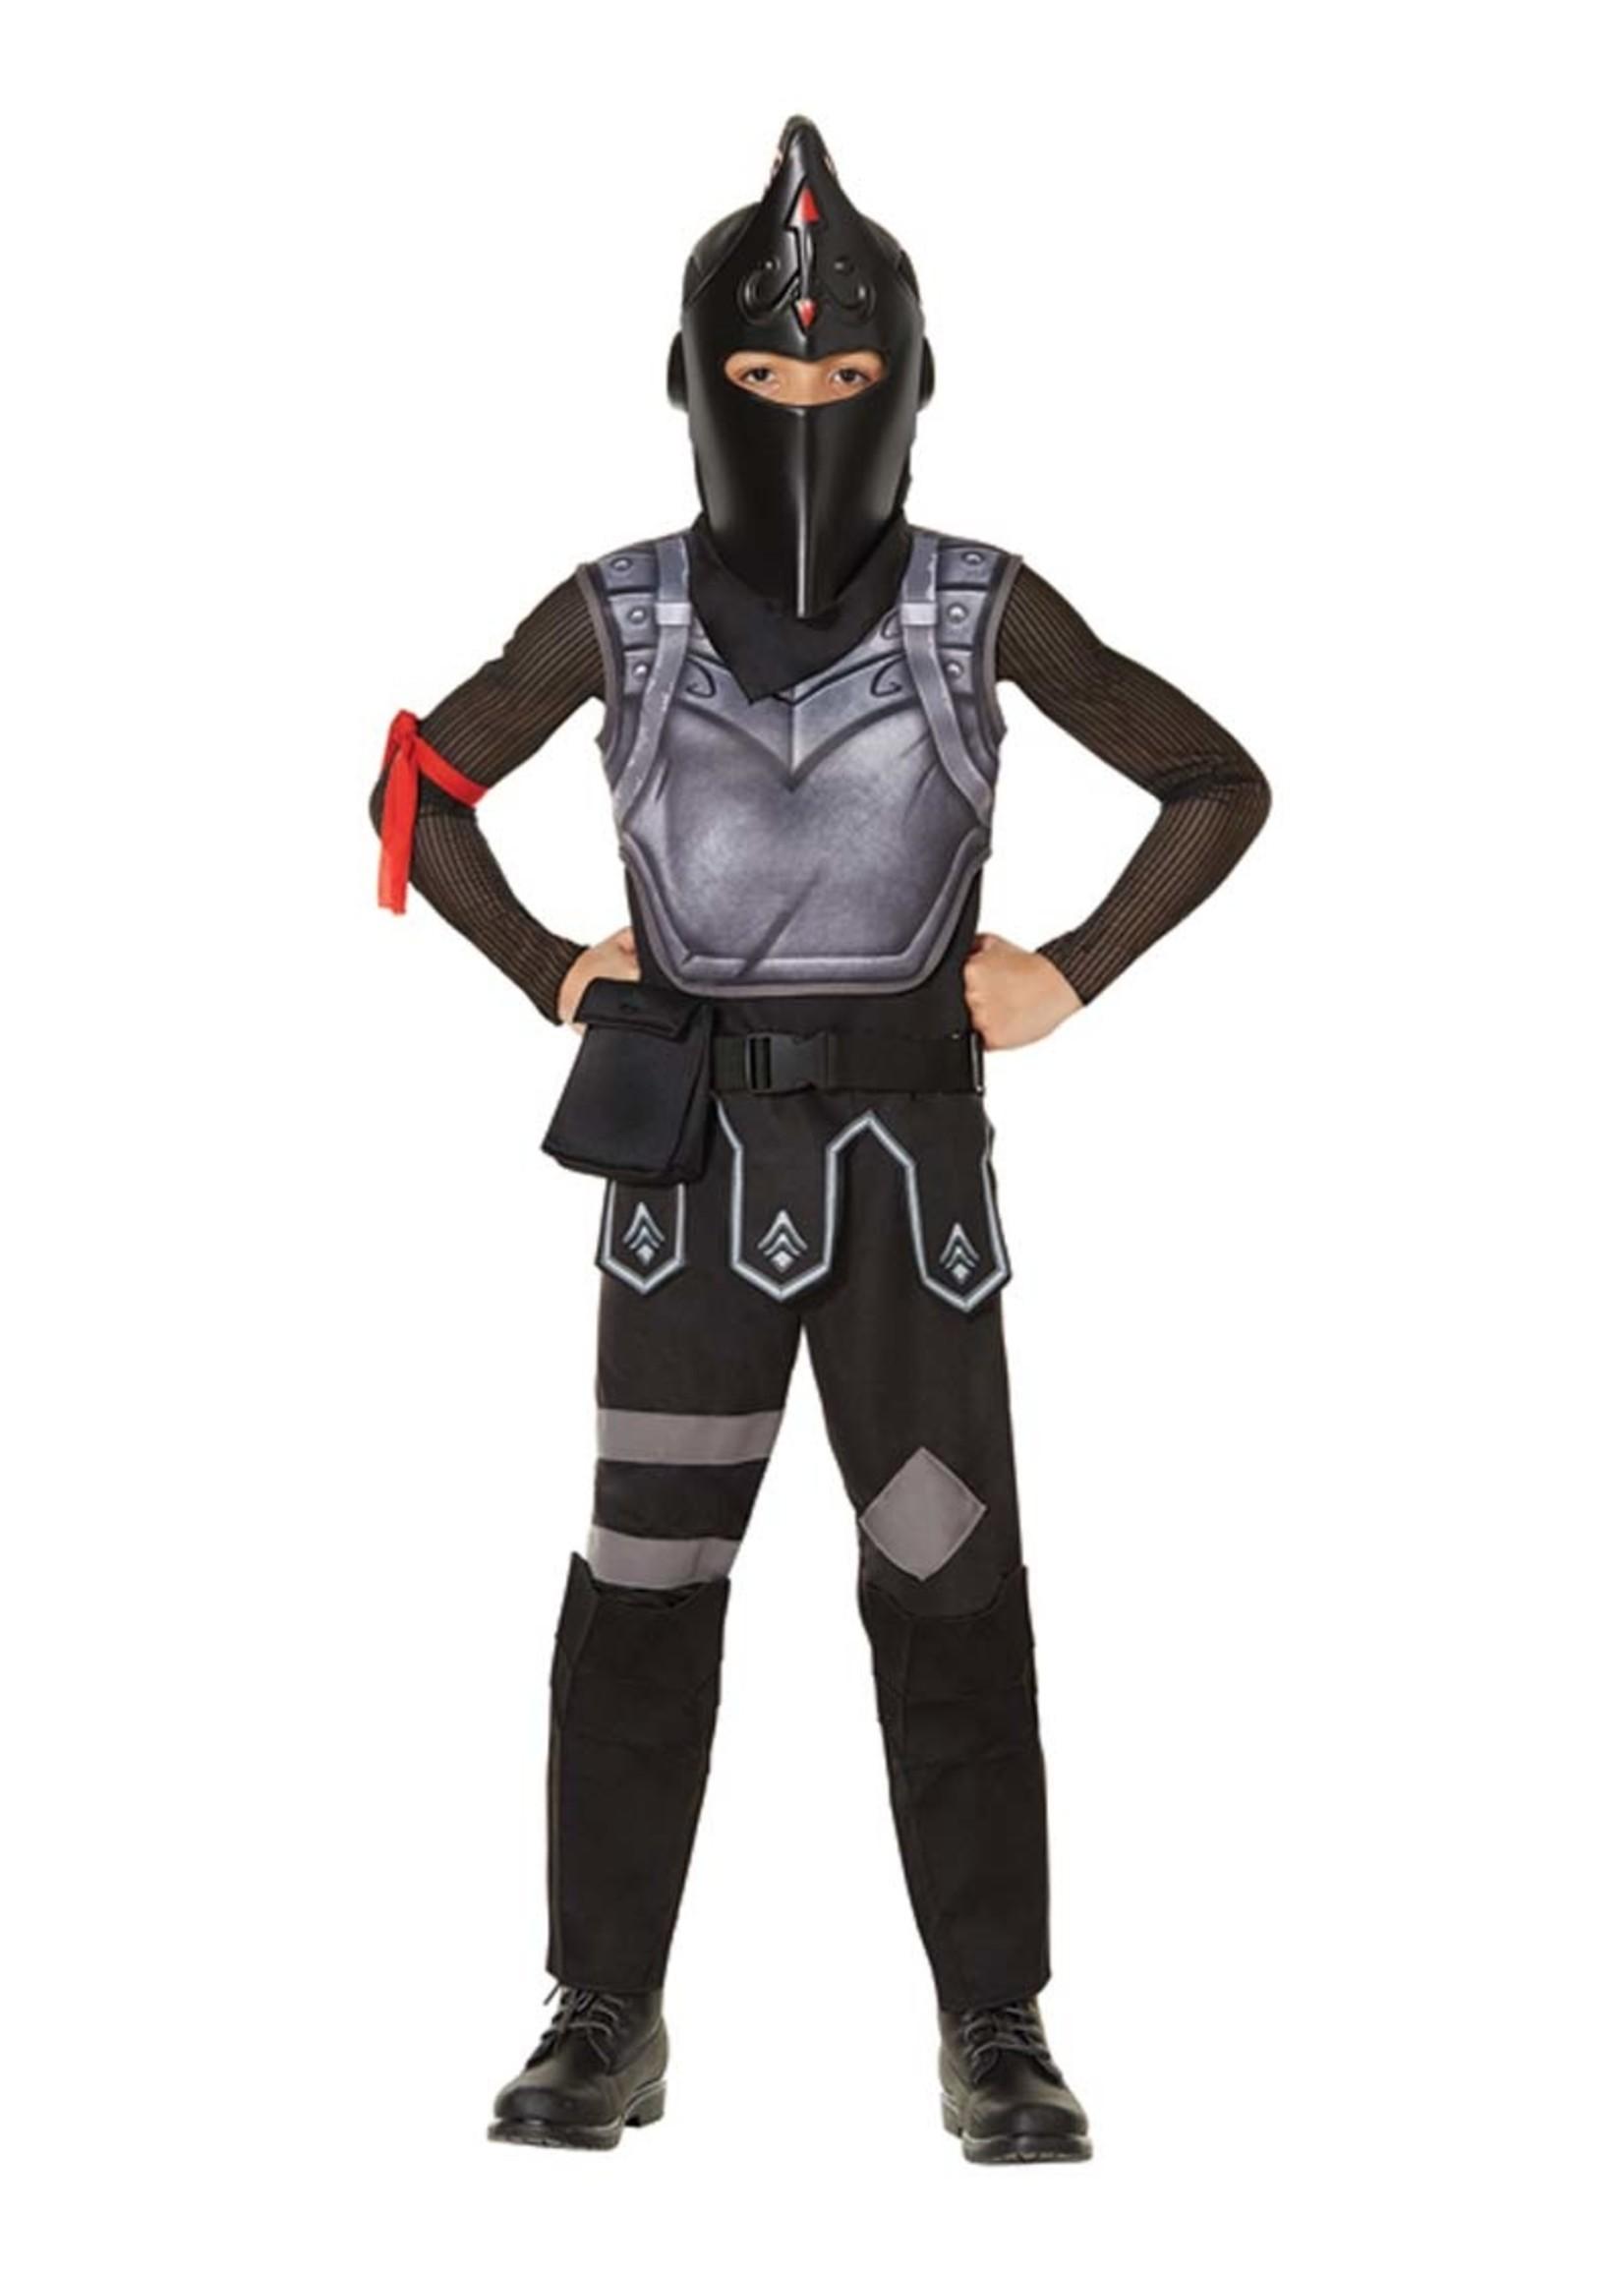 FUN WORLD Fortnite Black Knight - Boy's